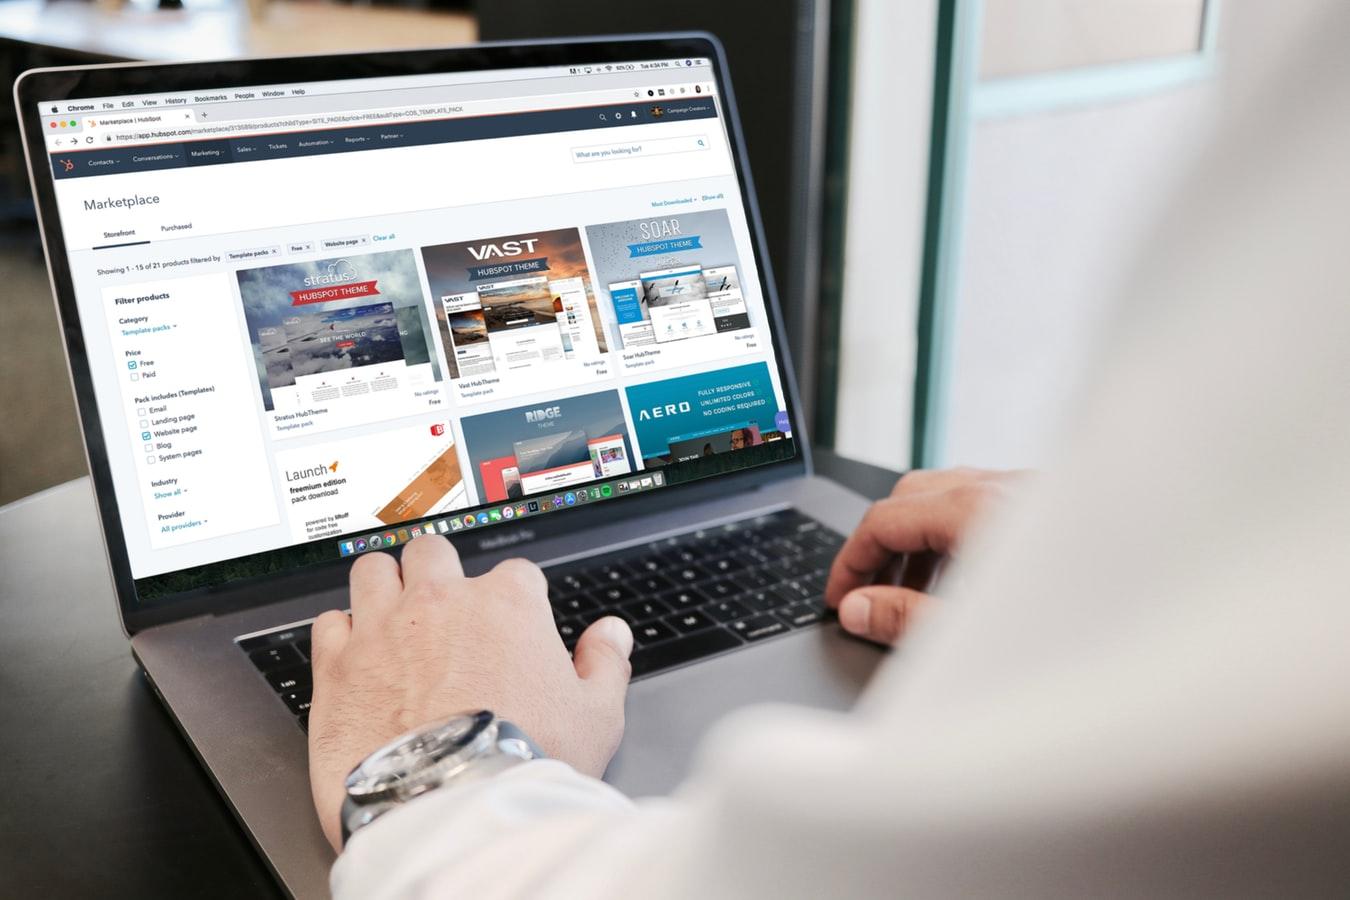 Best Business Laptops